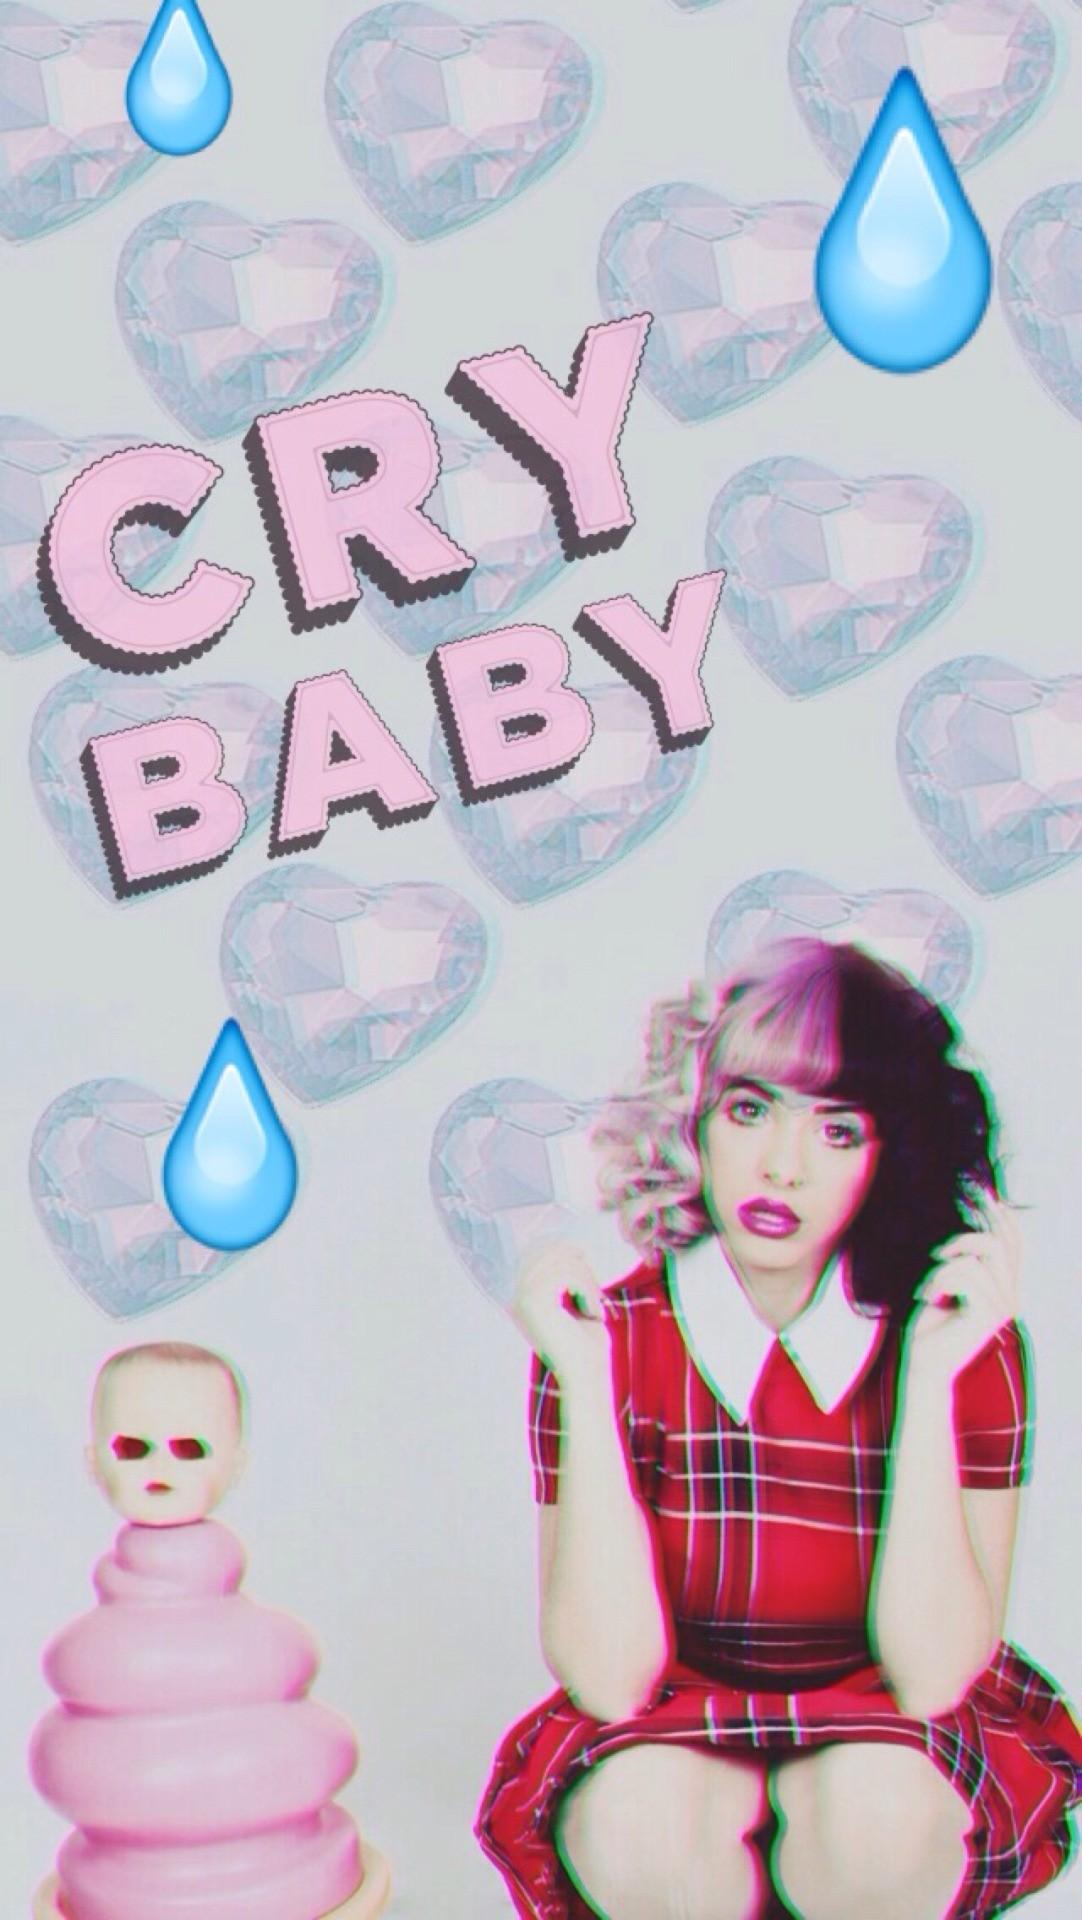 baes1c — Melanie Martinez 'cry baby' wallpapers! • like.